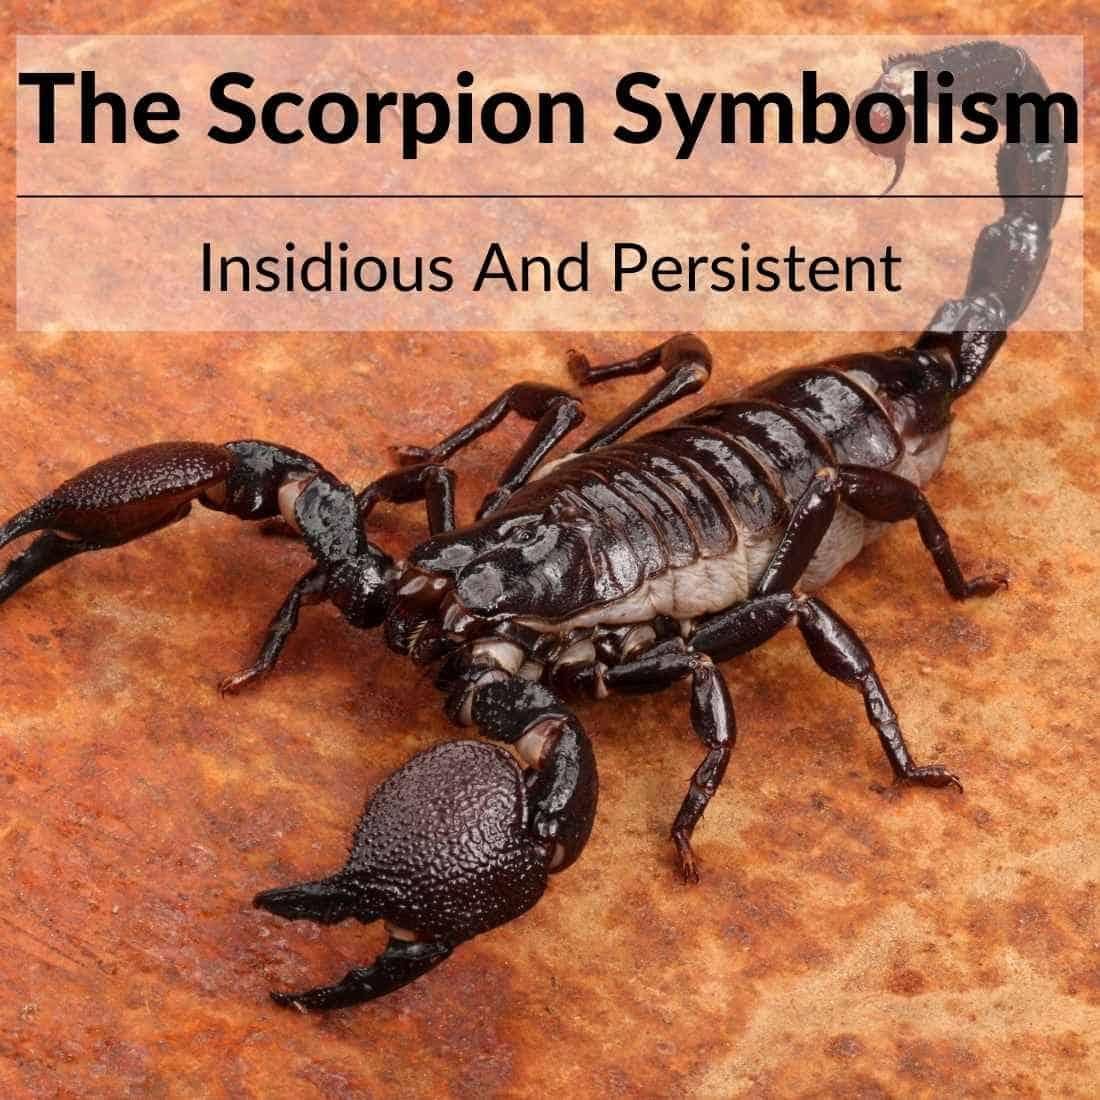 Scorpion symbolism